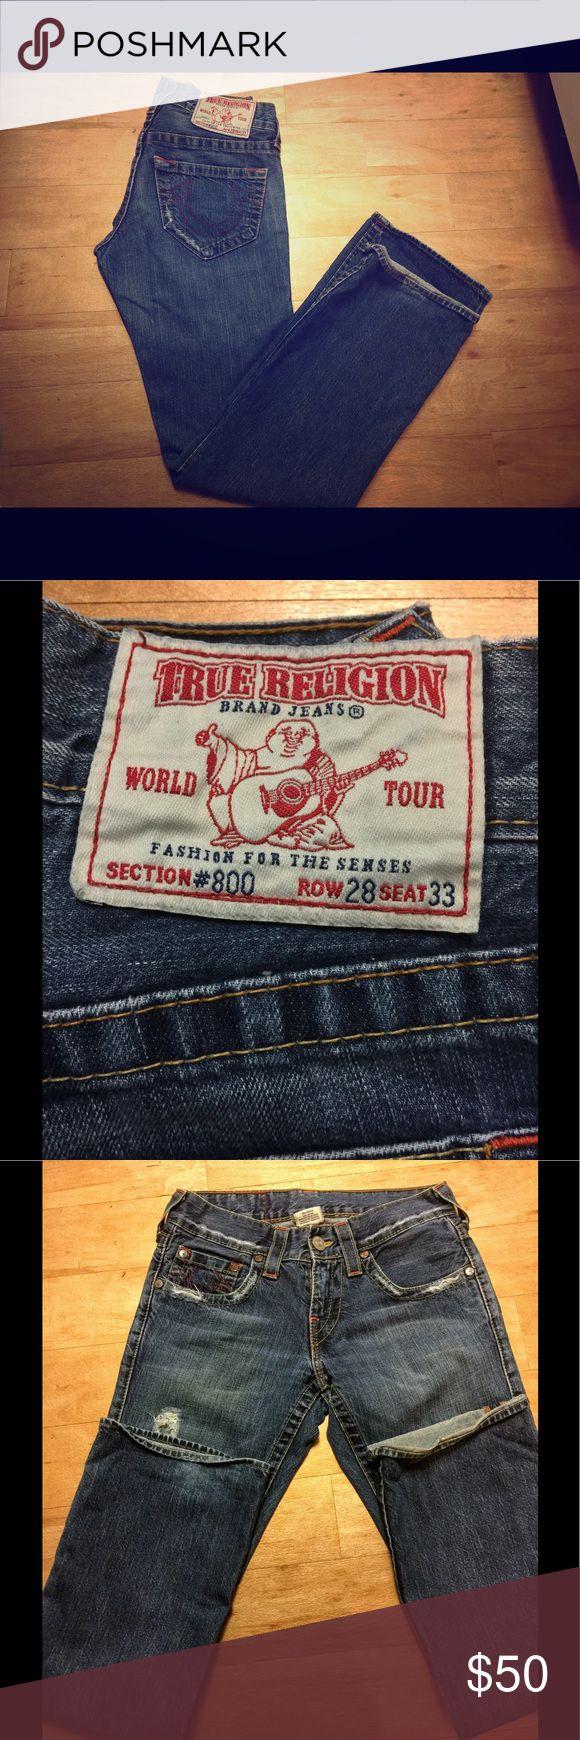 Men's Pre-2007 True Religion Jeans Nice pair of pre-2007 True Religion jeans with the old section, row, and seat numbers. True Religion Jeans Relaxed